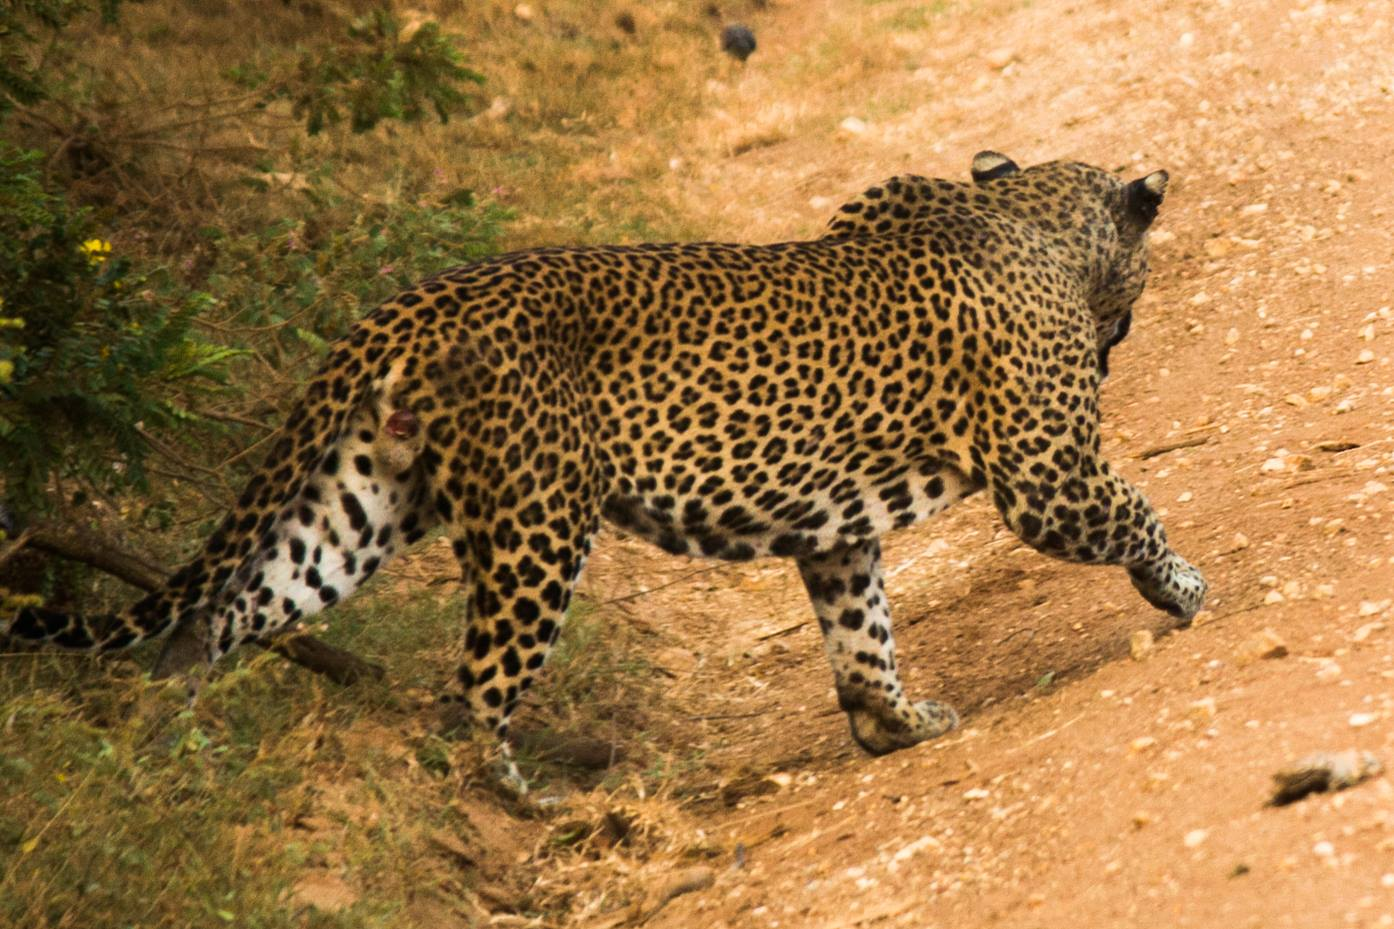 invite-to-paradise-sri-lanka-and-maldives-specialists-travel-agent-tour-operator-customer-review--feedback-joel-rhian-wildlife-leopard-safari-yala.jpg